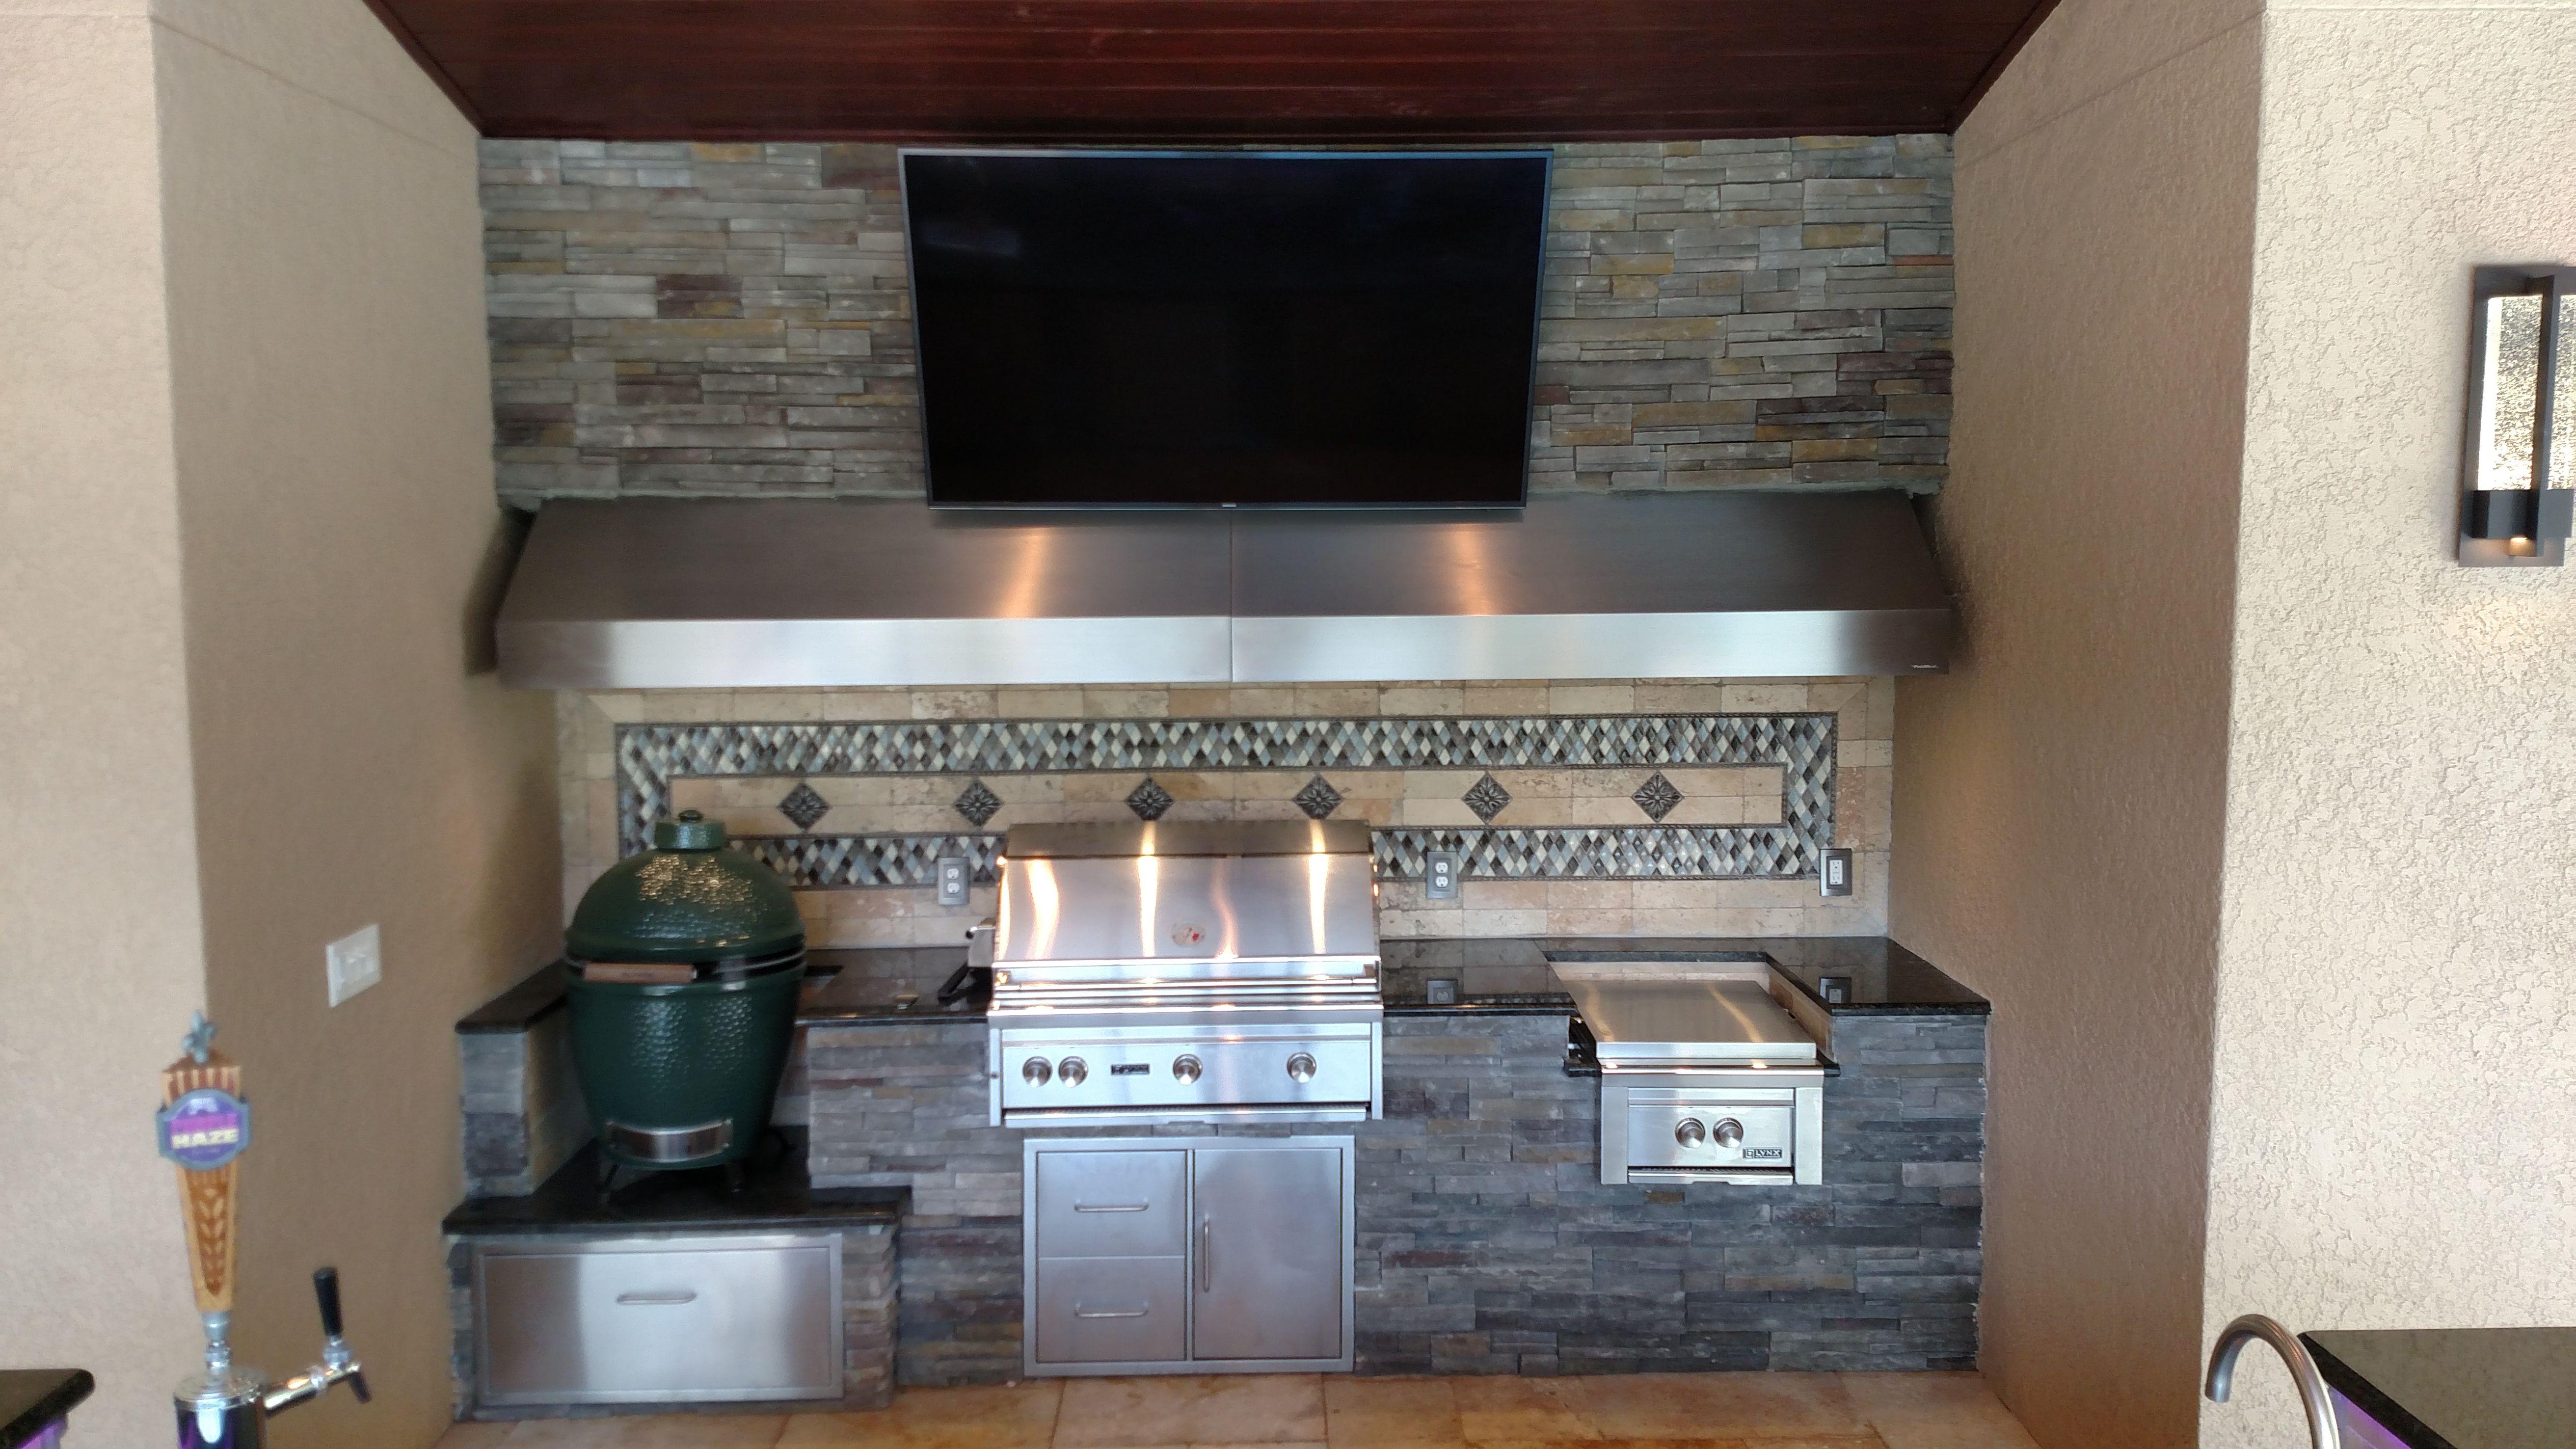 All Pro Standard 30 Inch Storage Drawer Outdoor Kitchen Bars Outdoor Kitchen Backyard Spaces